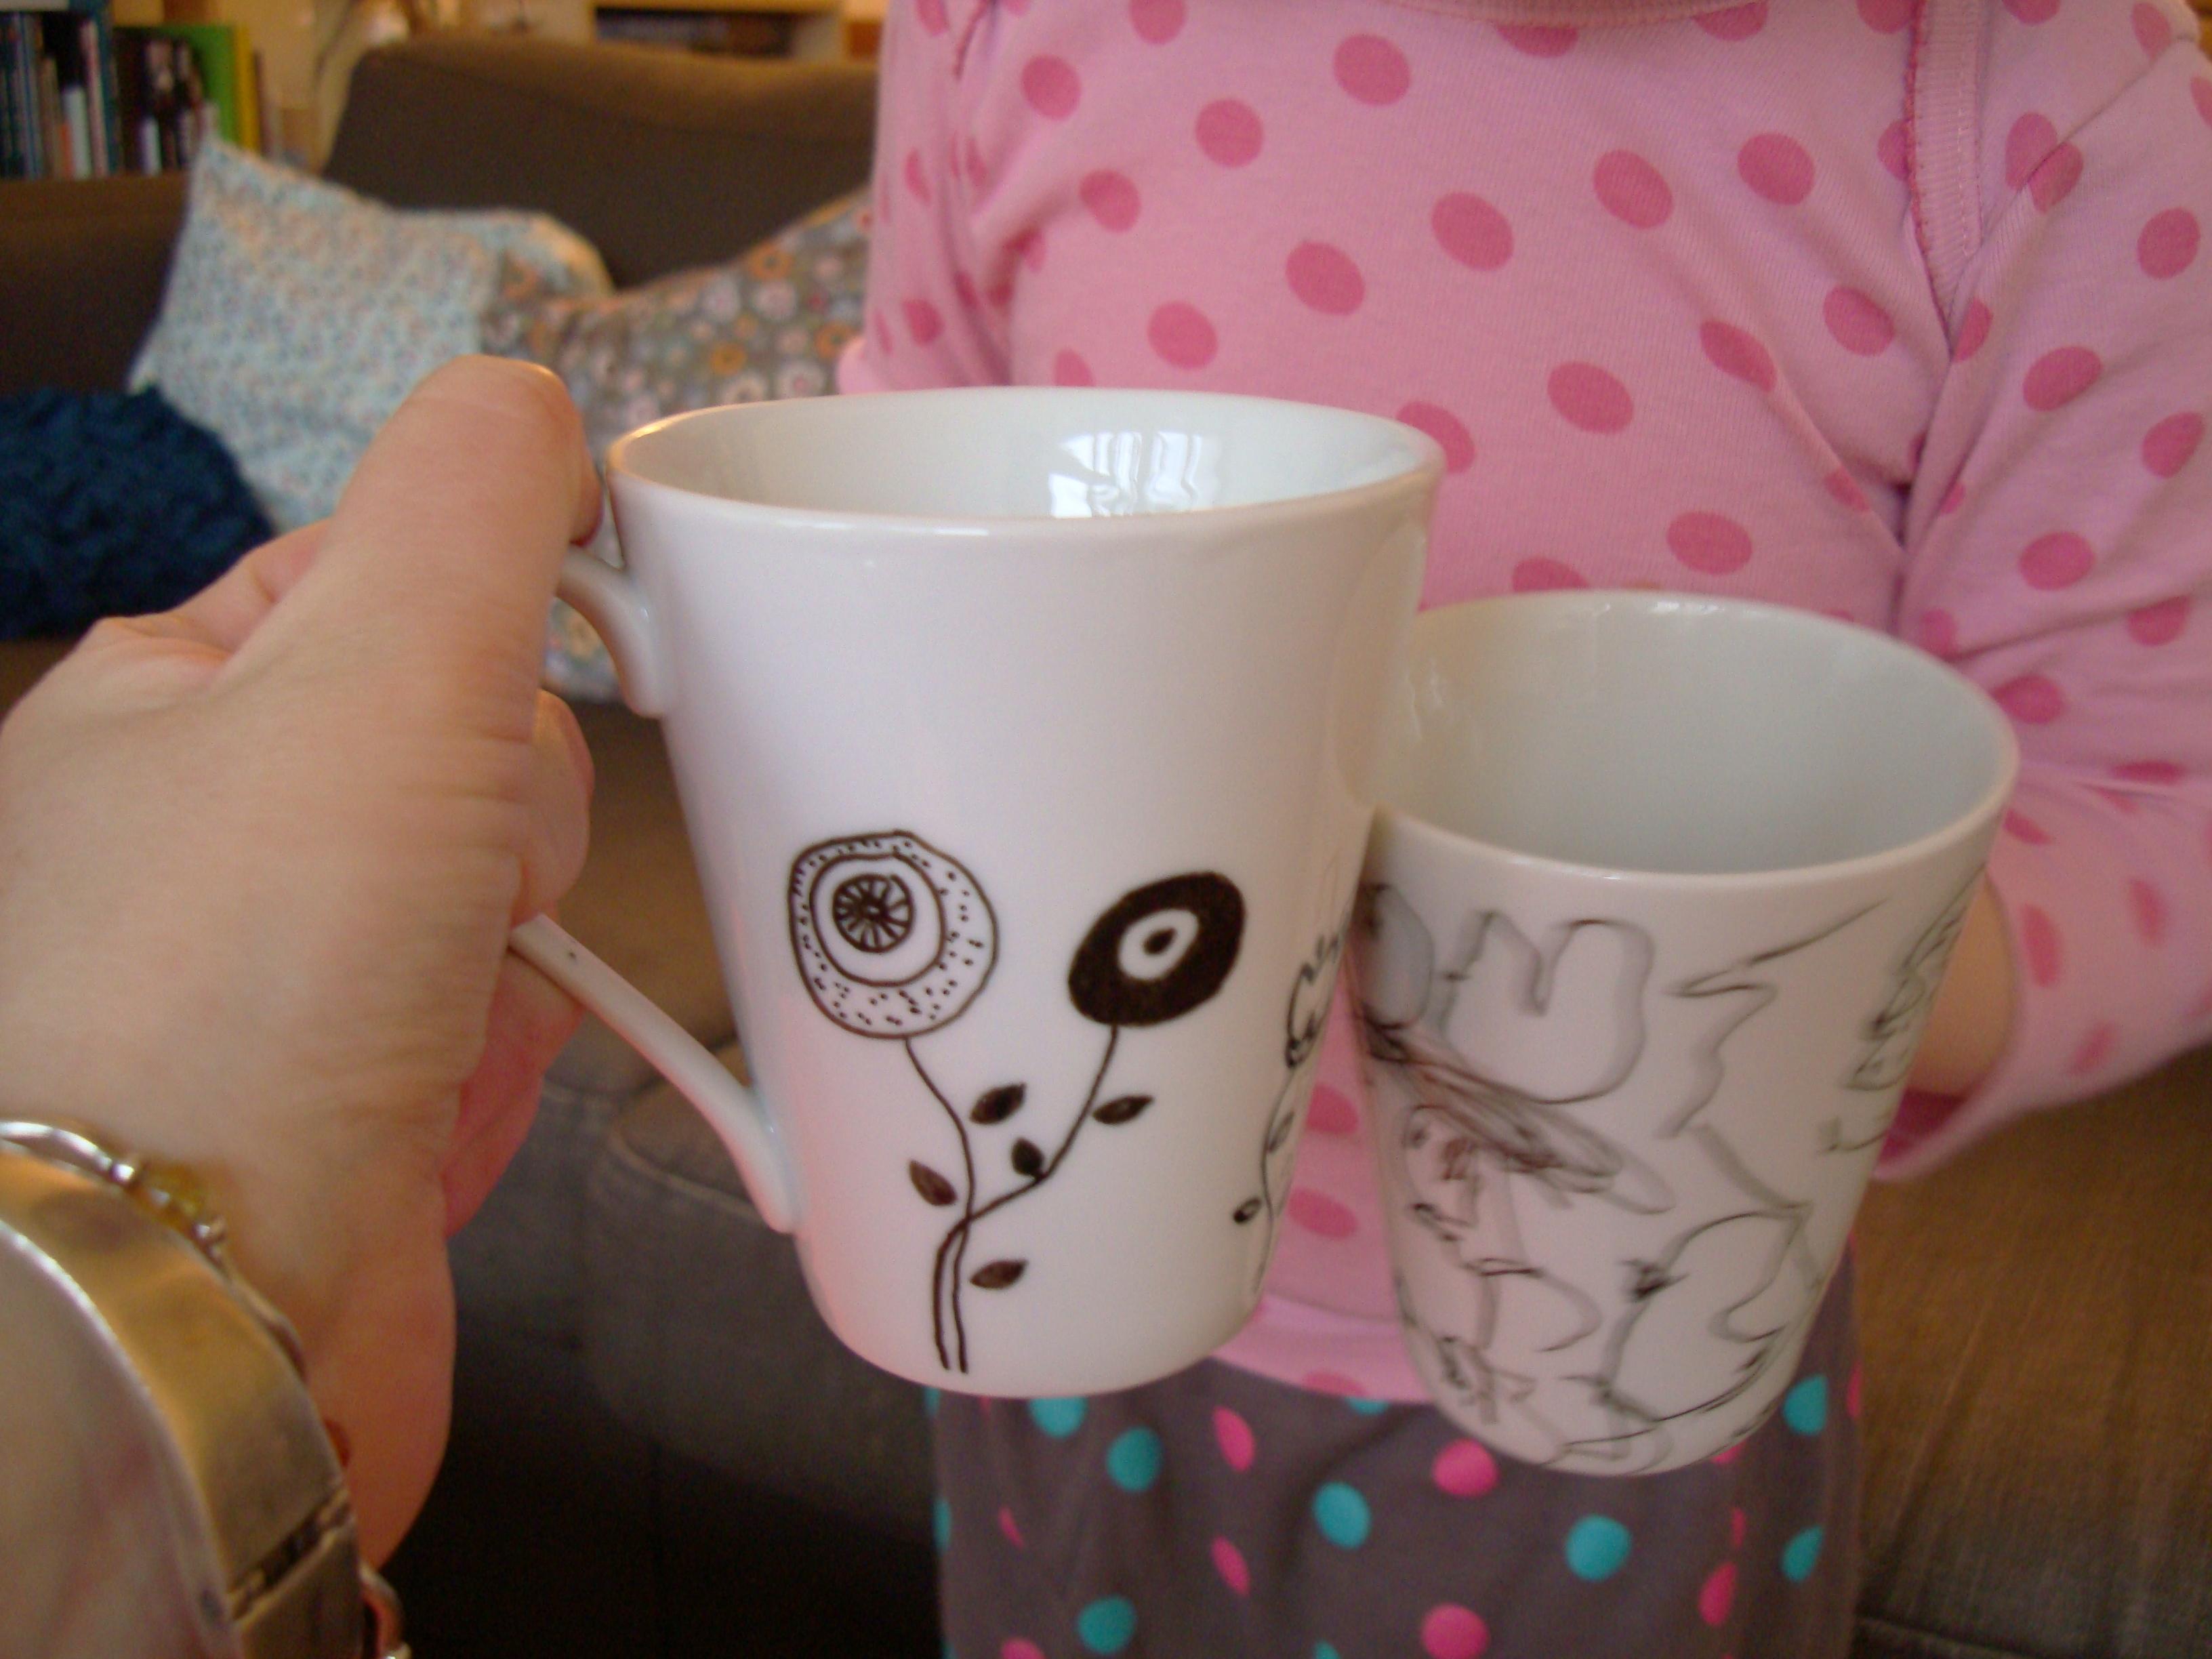 2 fille 1 tasse pleine